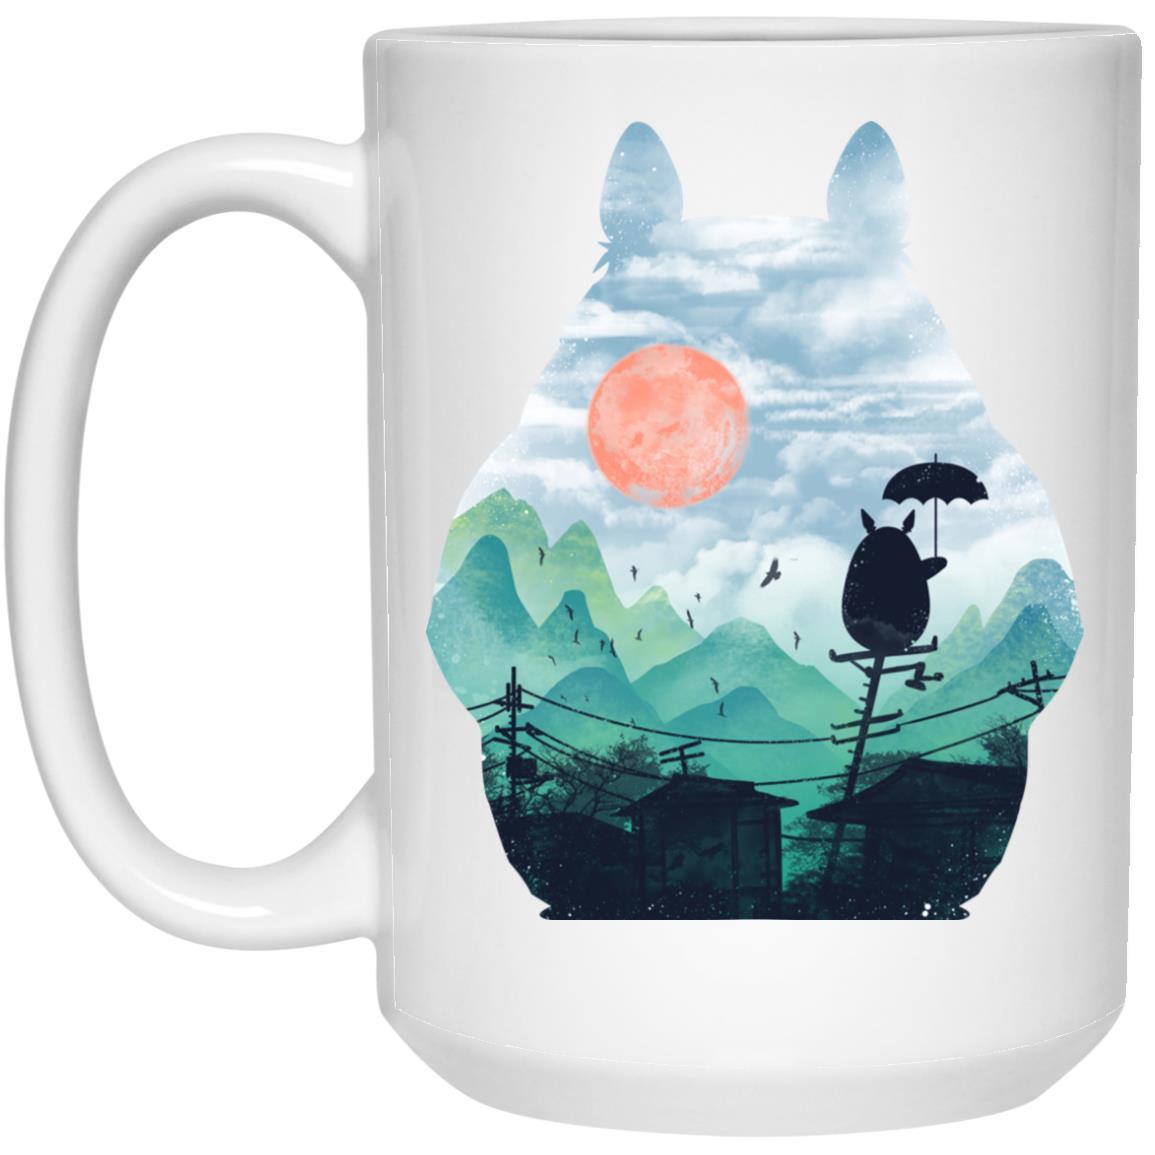 Totoro on the Line Lanscape Mug